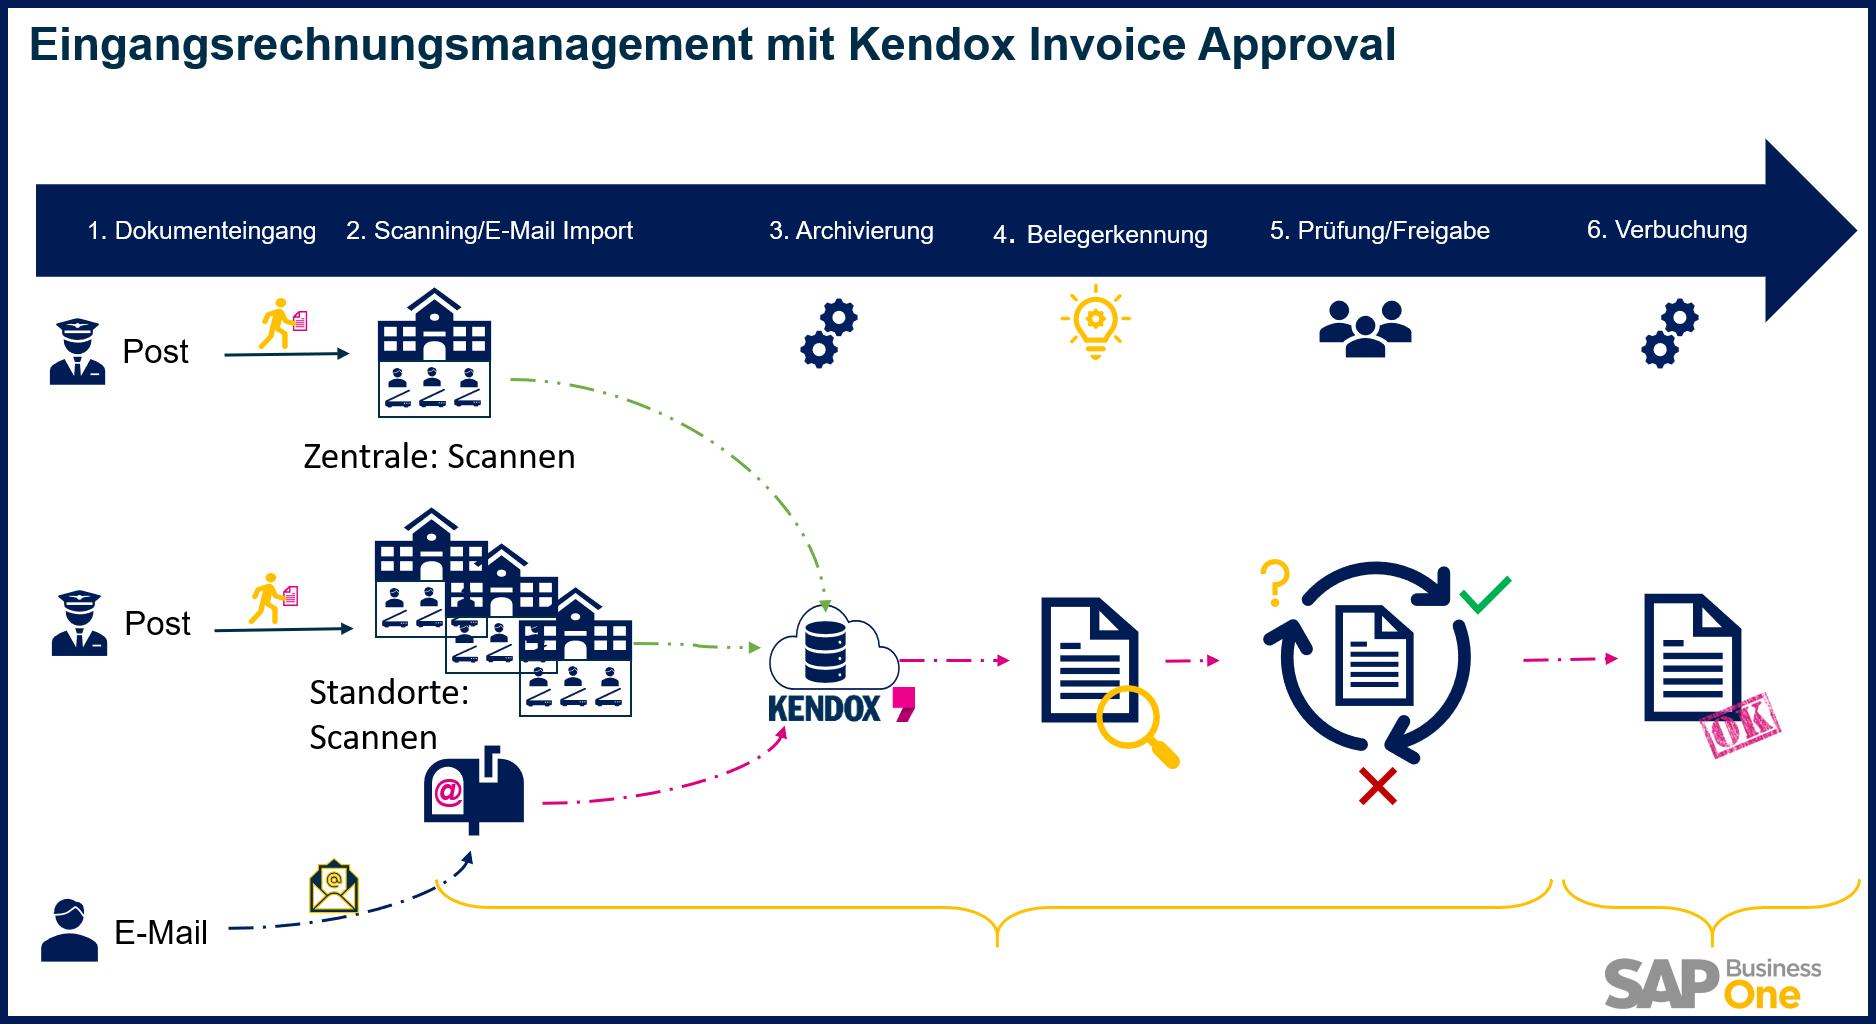 Eingangsrechnungsmanagement mit Kendox Invoice Approval